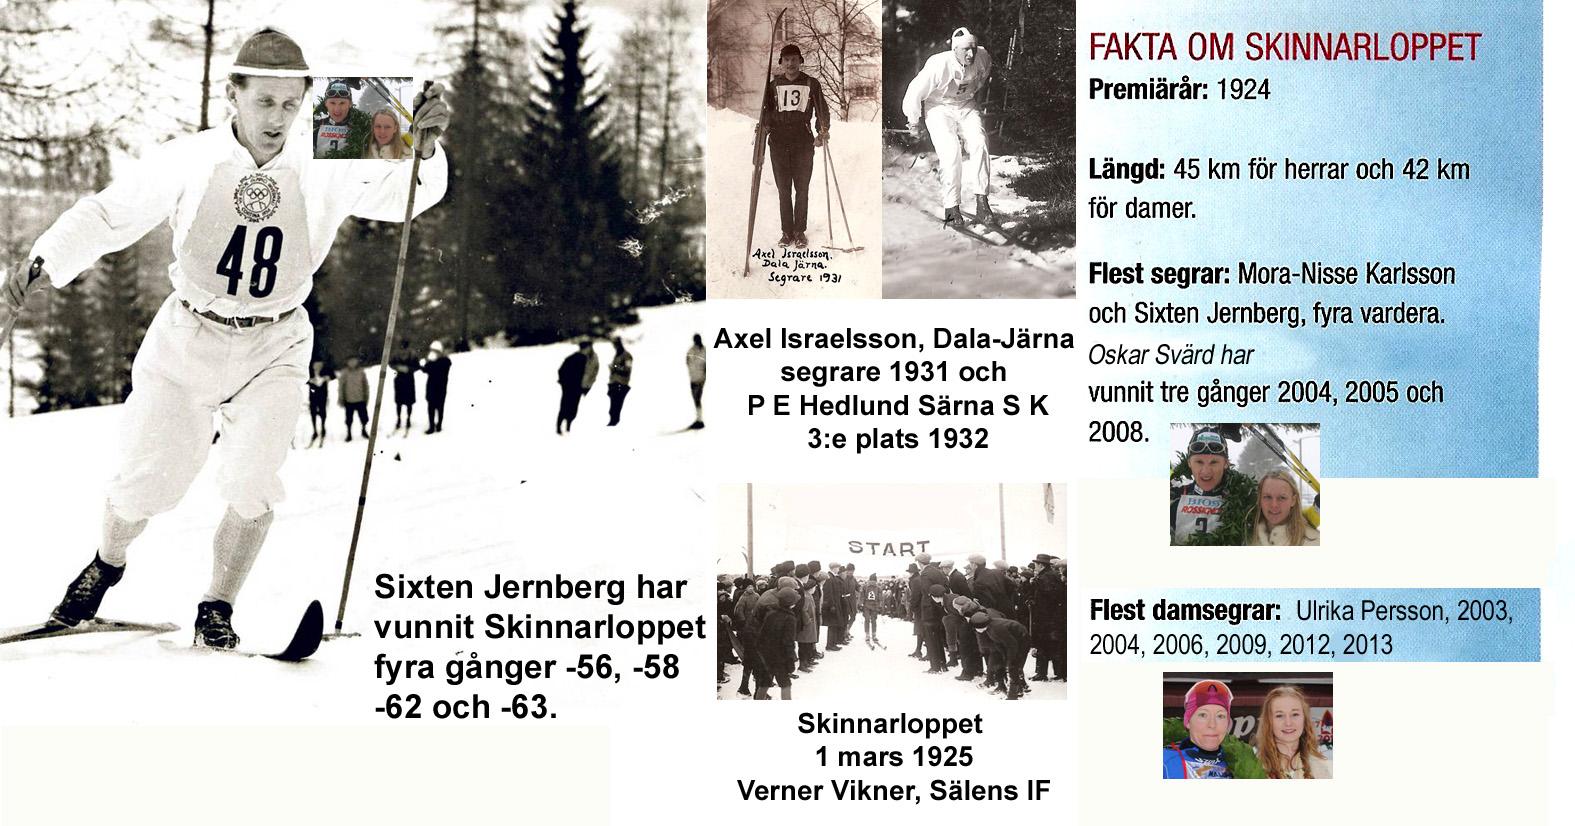 fakta_skinnarloppet2